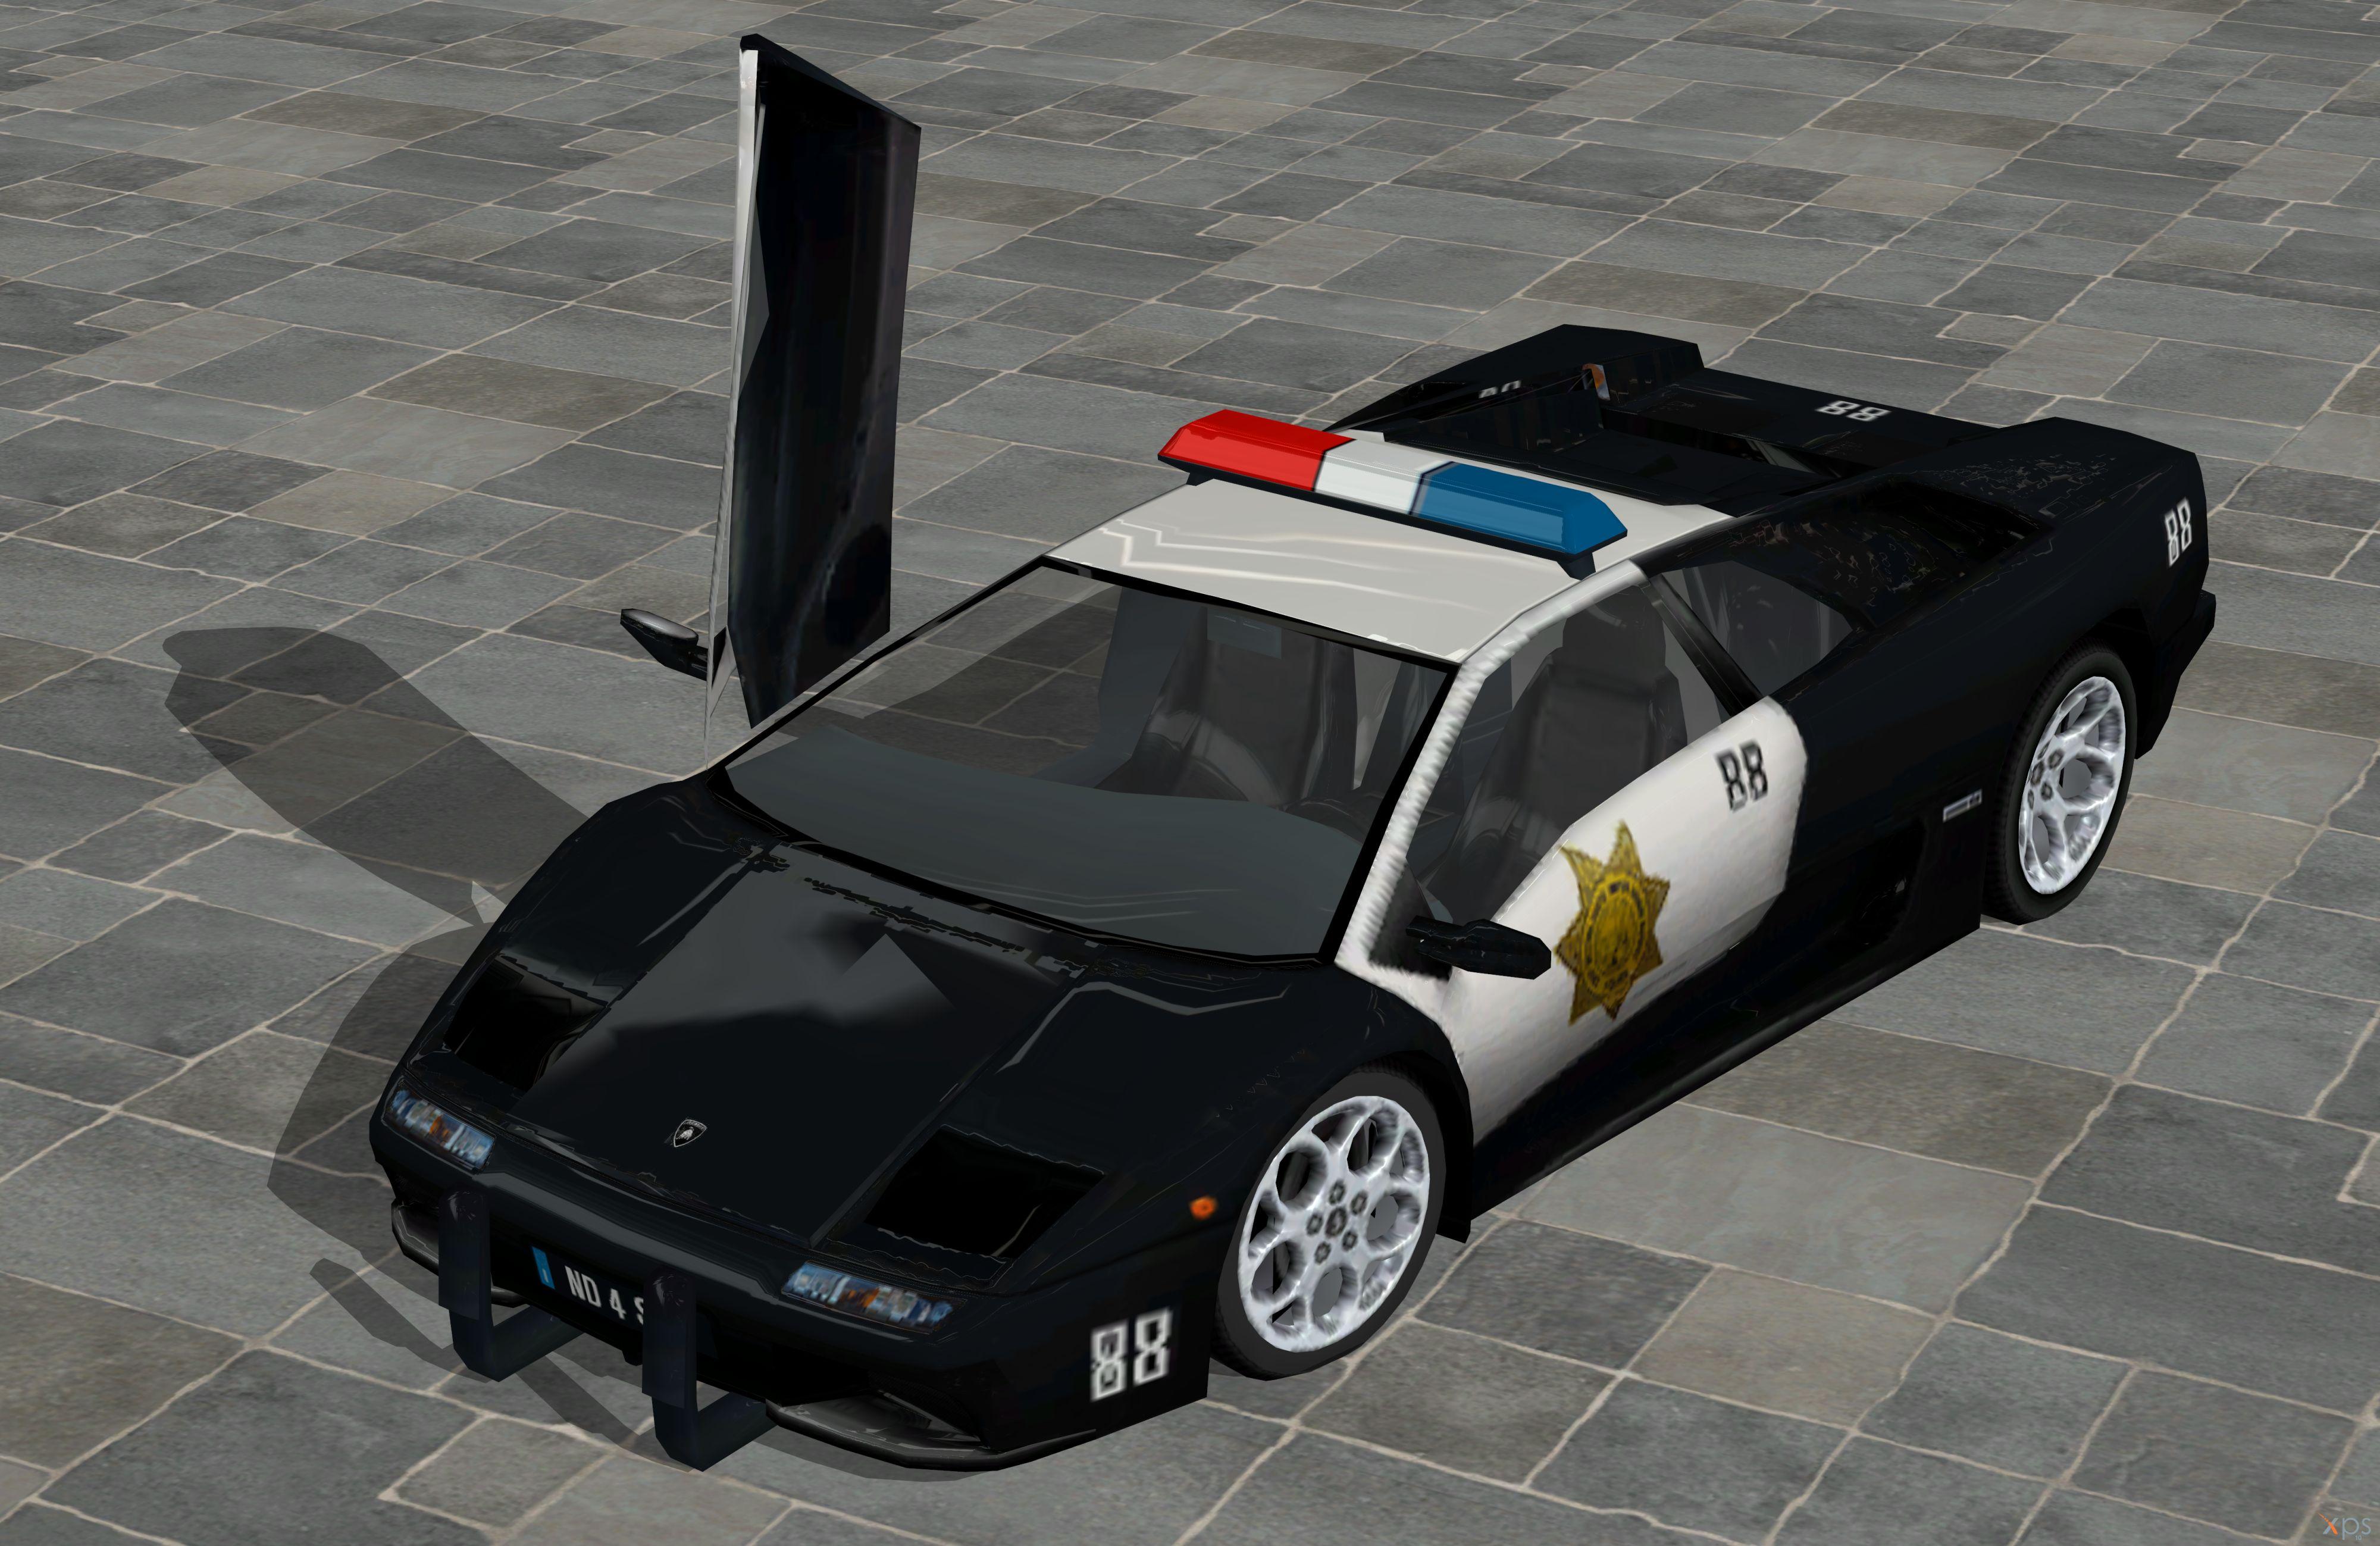 39 nfs hot pursuit 2 39 lamborghini police xps only by lezisell on deviantart. Black Bedroom Furniture Sets. Home Design Ideas